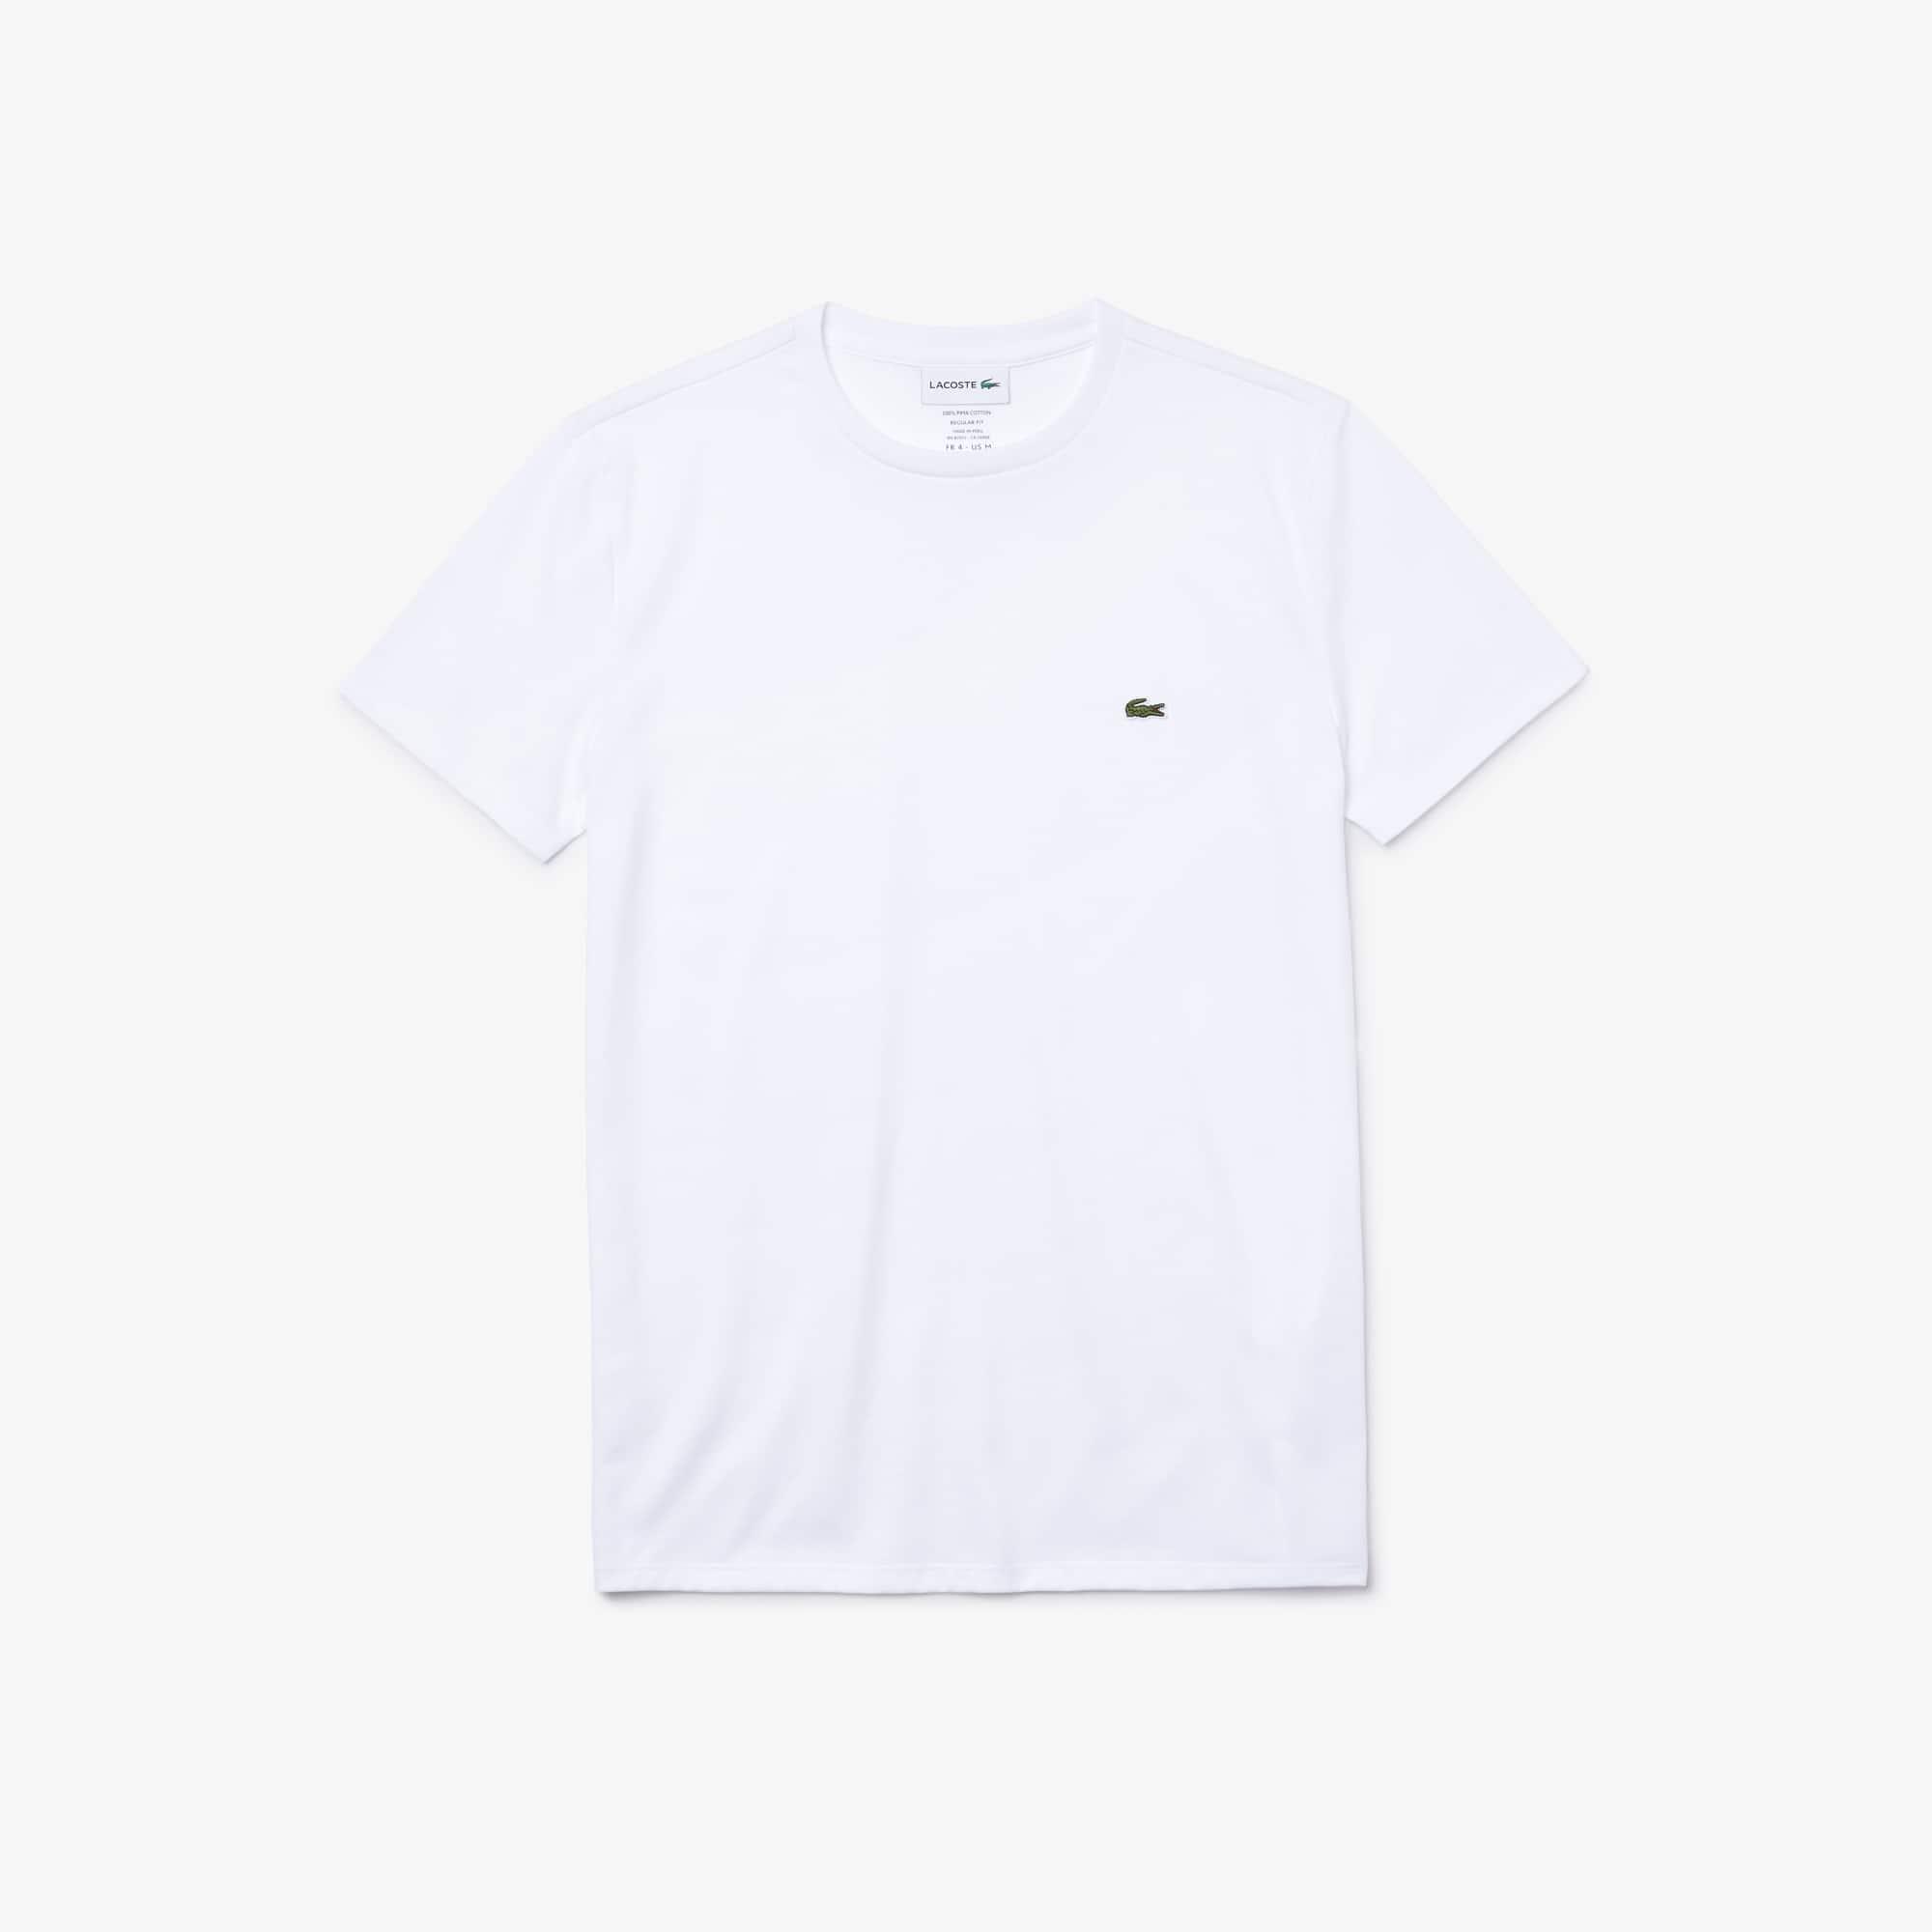 bd54ff8ae4 Men's Crew Neck Pima Cotton Jersey T-shirt